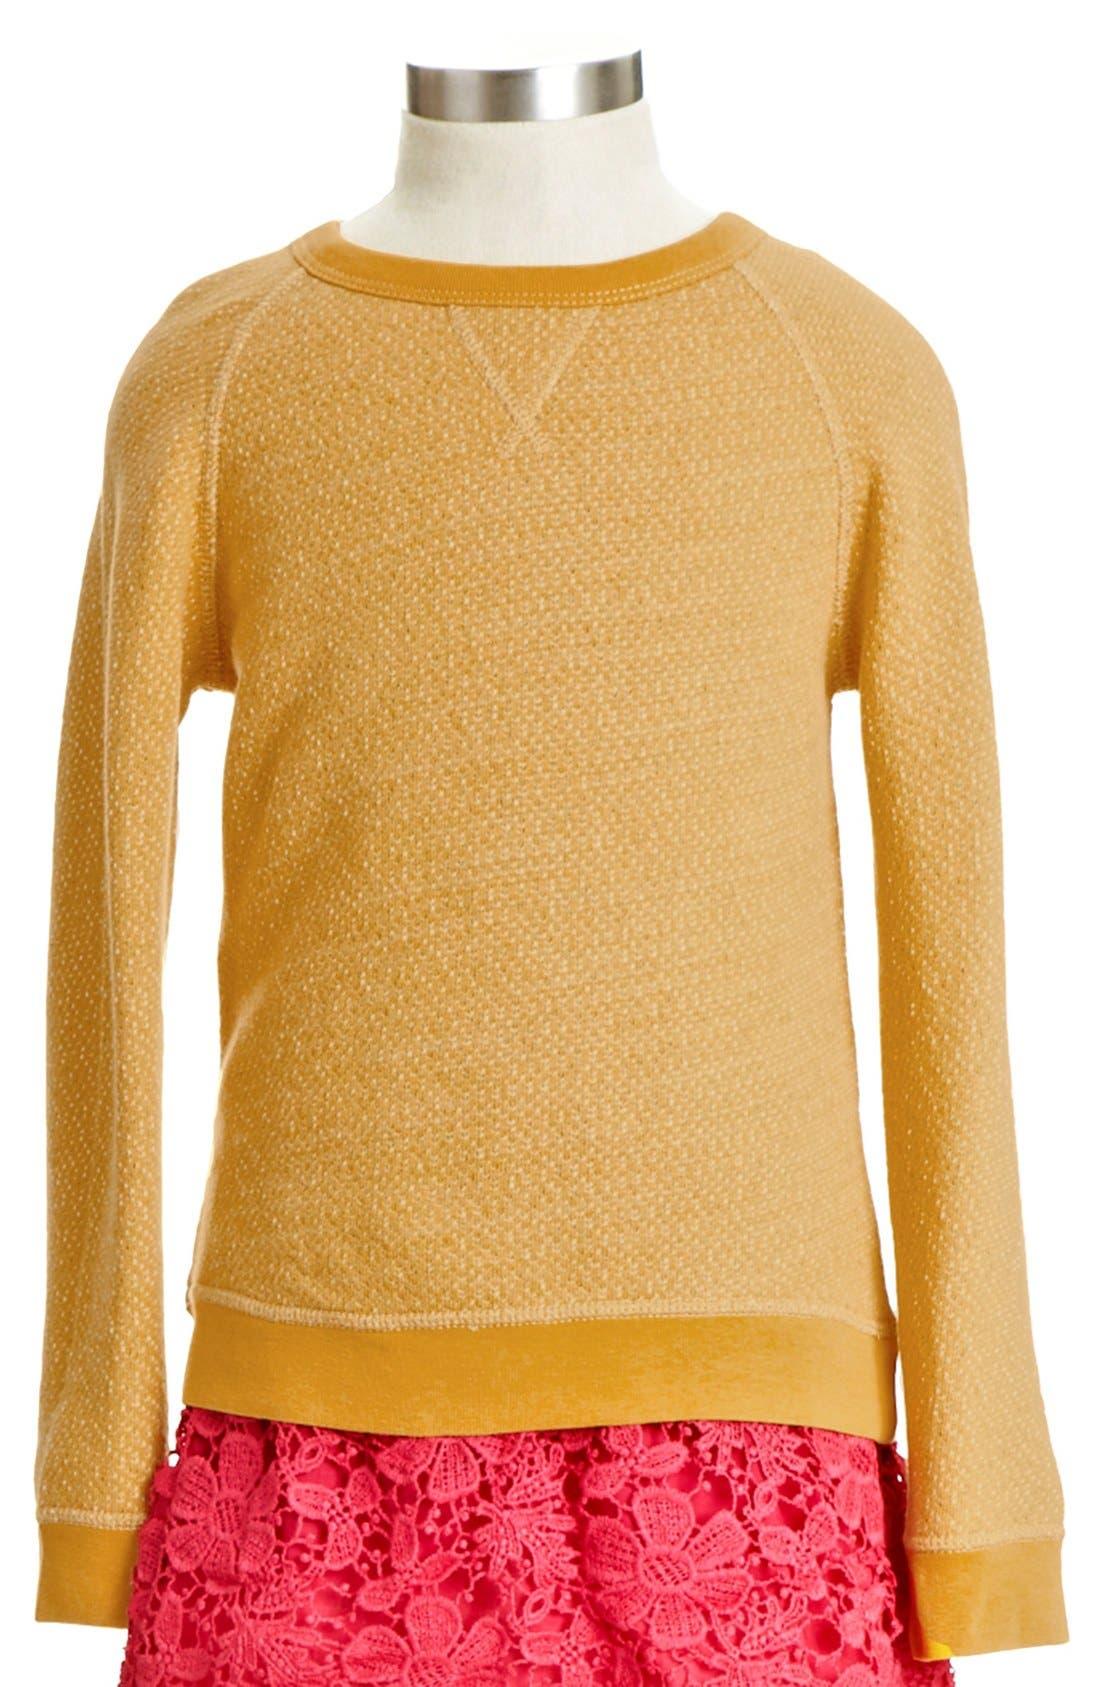 Alternate Image 1 Selected - Peek 'Kylie' Sweatshirt (Toddler Girls, Little Girls & Big Girls)